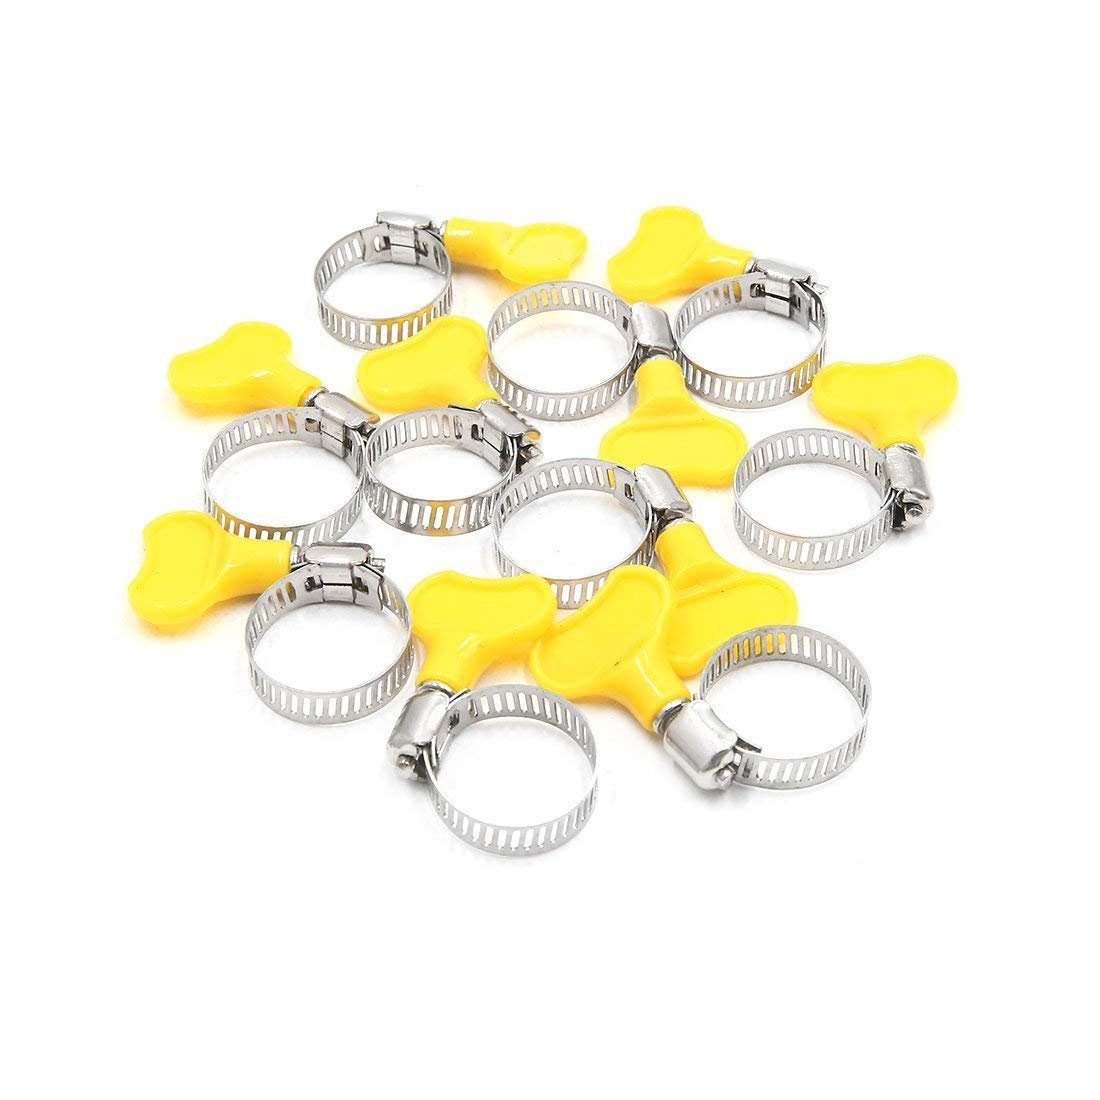 10Pcs Metal Adjustable 16-25mm Hose Clamp Fuel Tube Tight Clip w Plastic Handle Auxcell Ltd